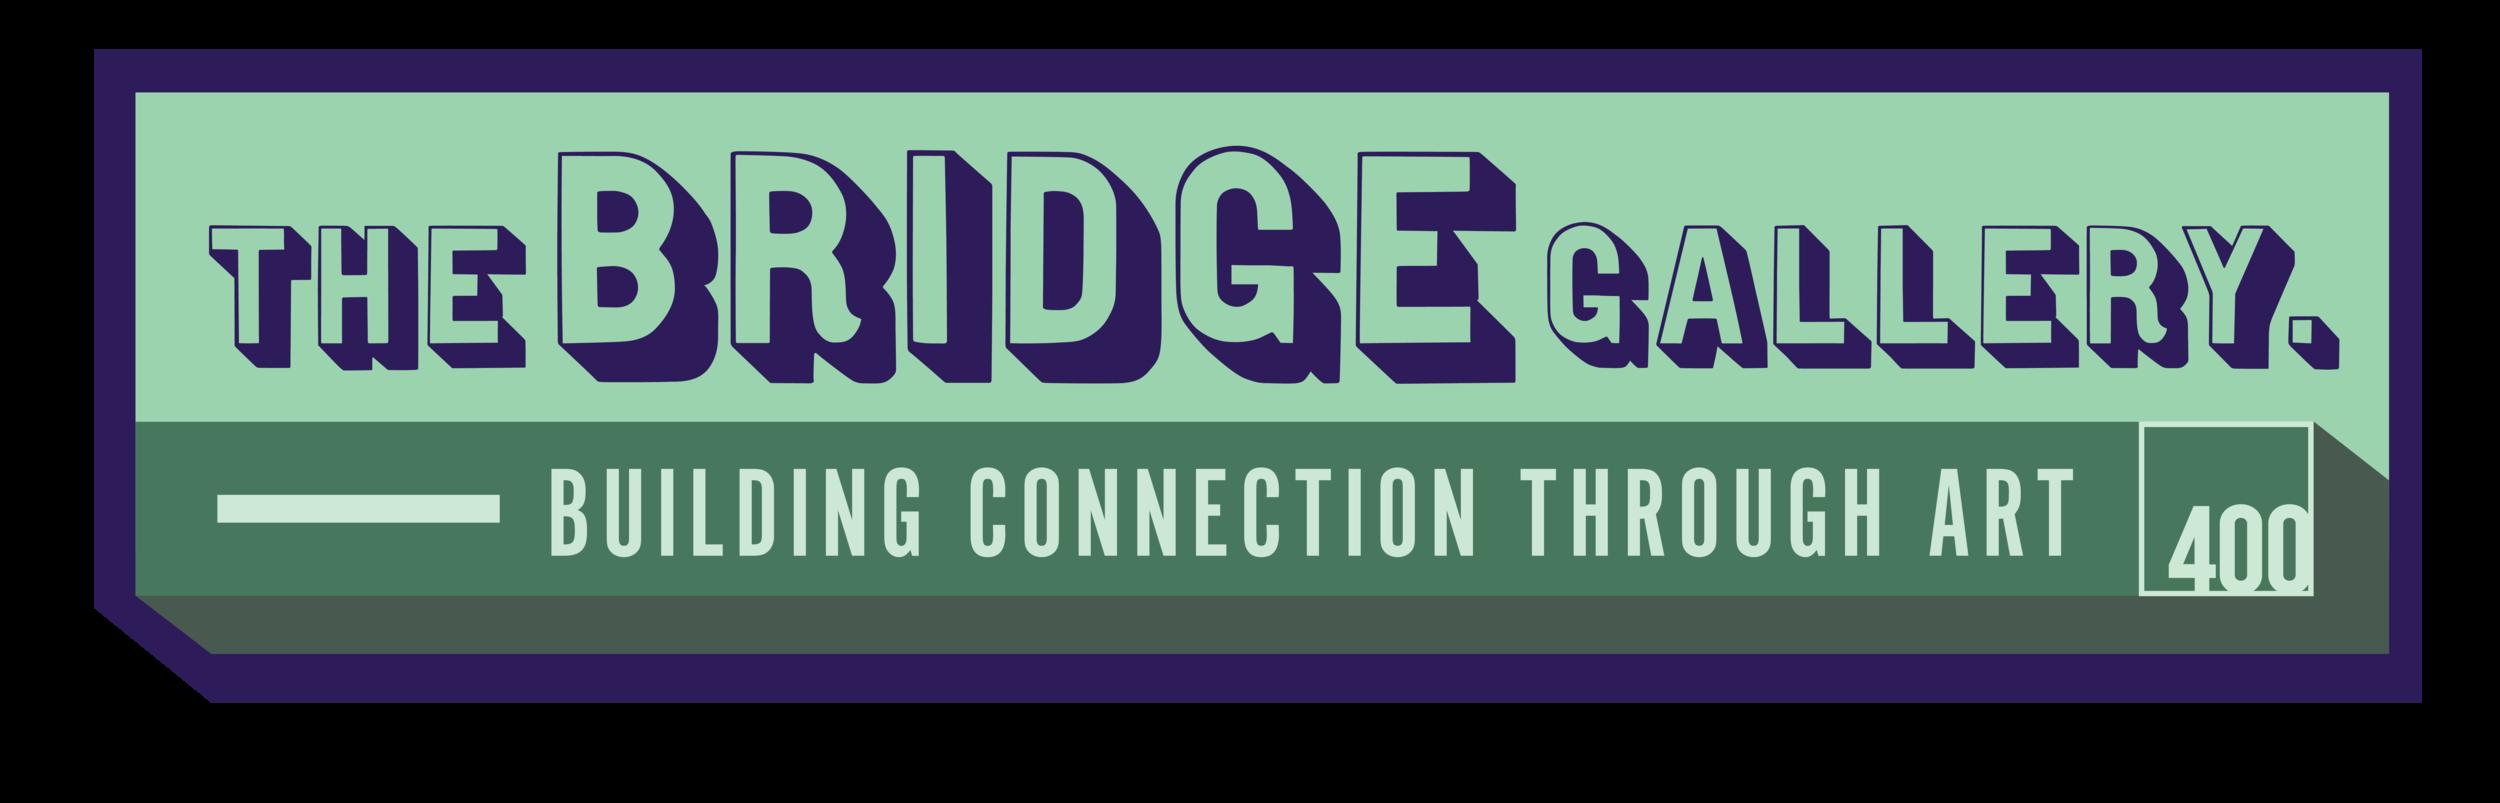 bridgegallery-09.png